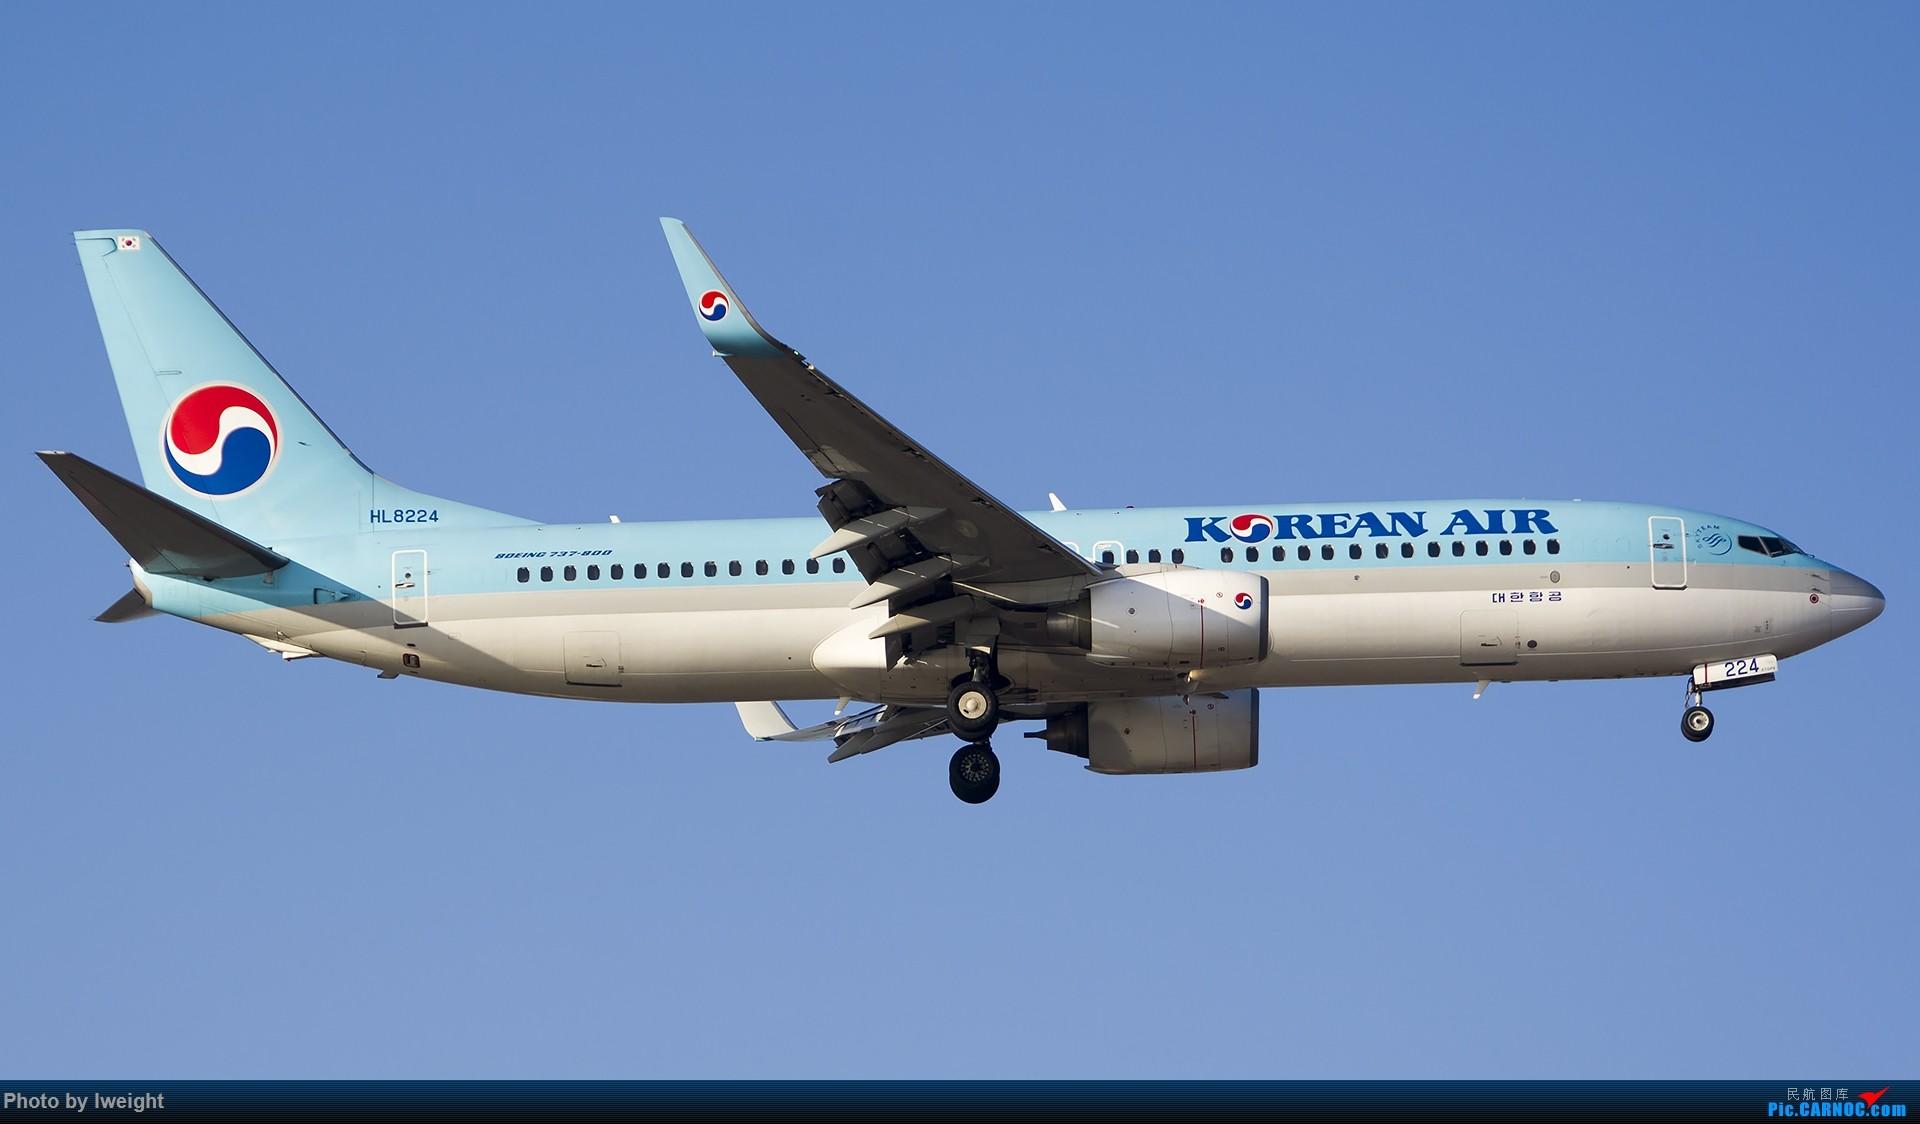 Re:[原创]庆祝升级777,发上今天在首都机场拍的所有飞机【2014-12-14】 BOEING 737-800 HL8224 中国北京首都国际机场